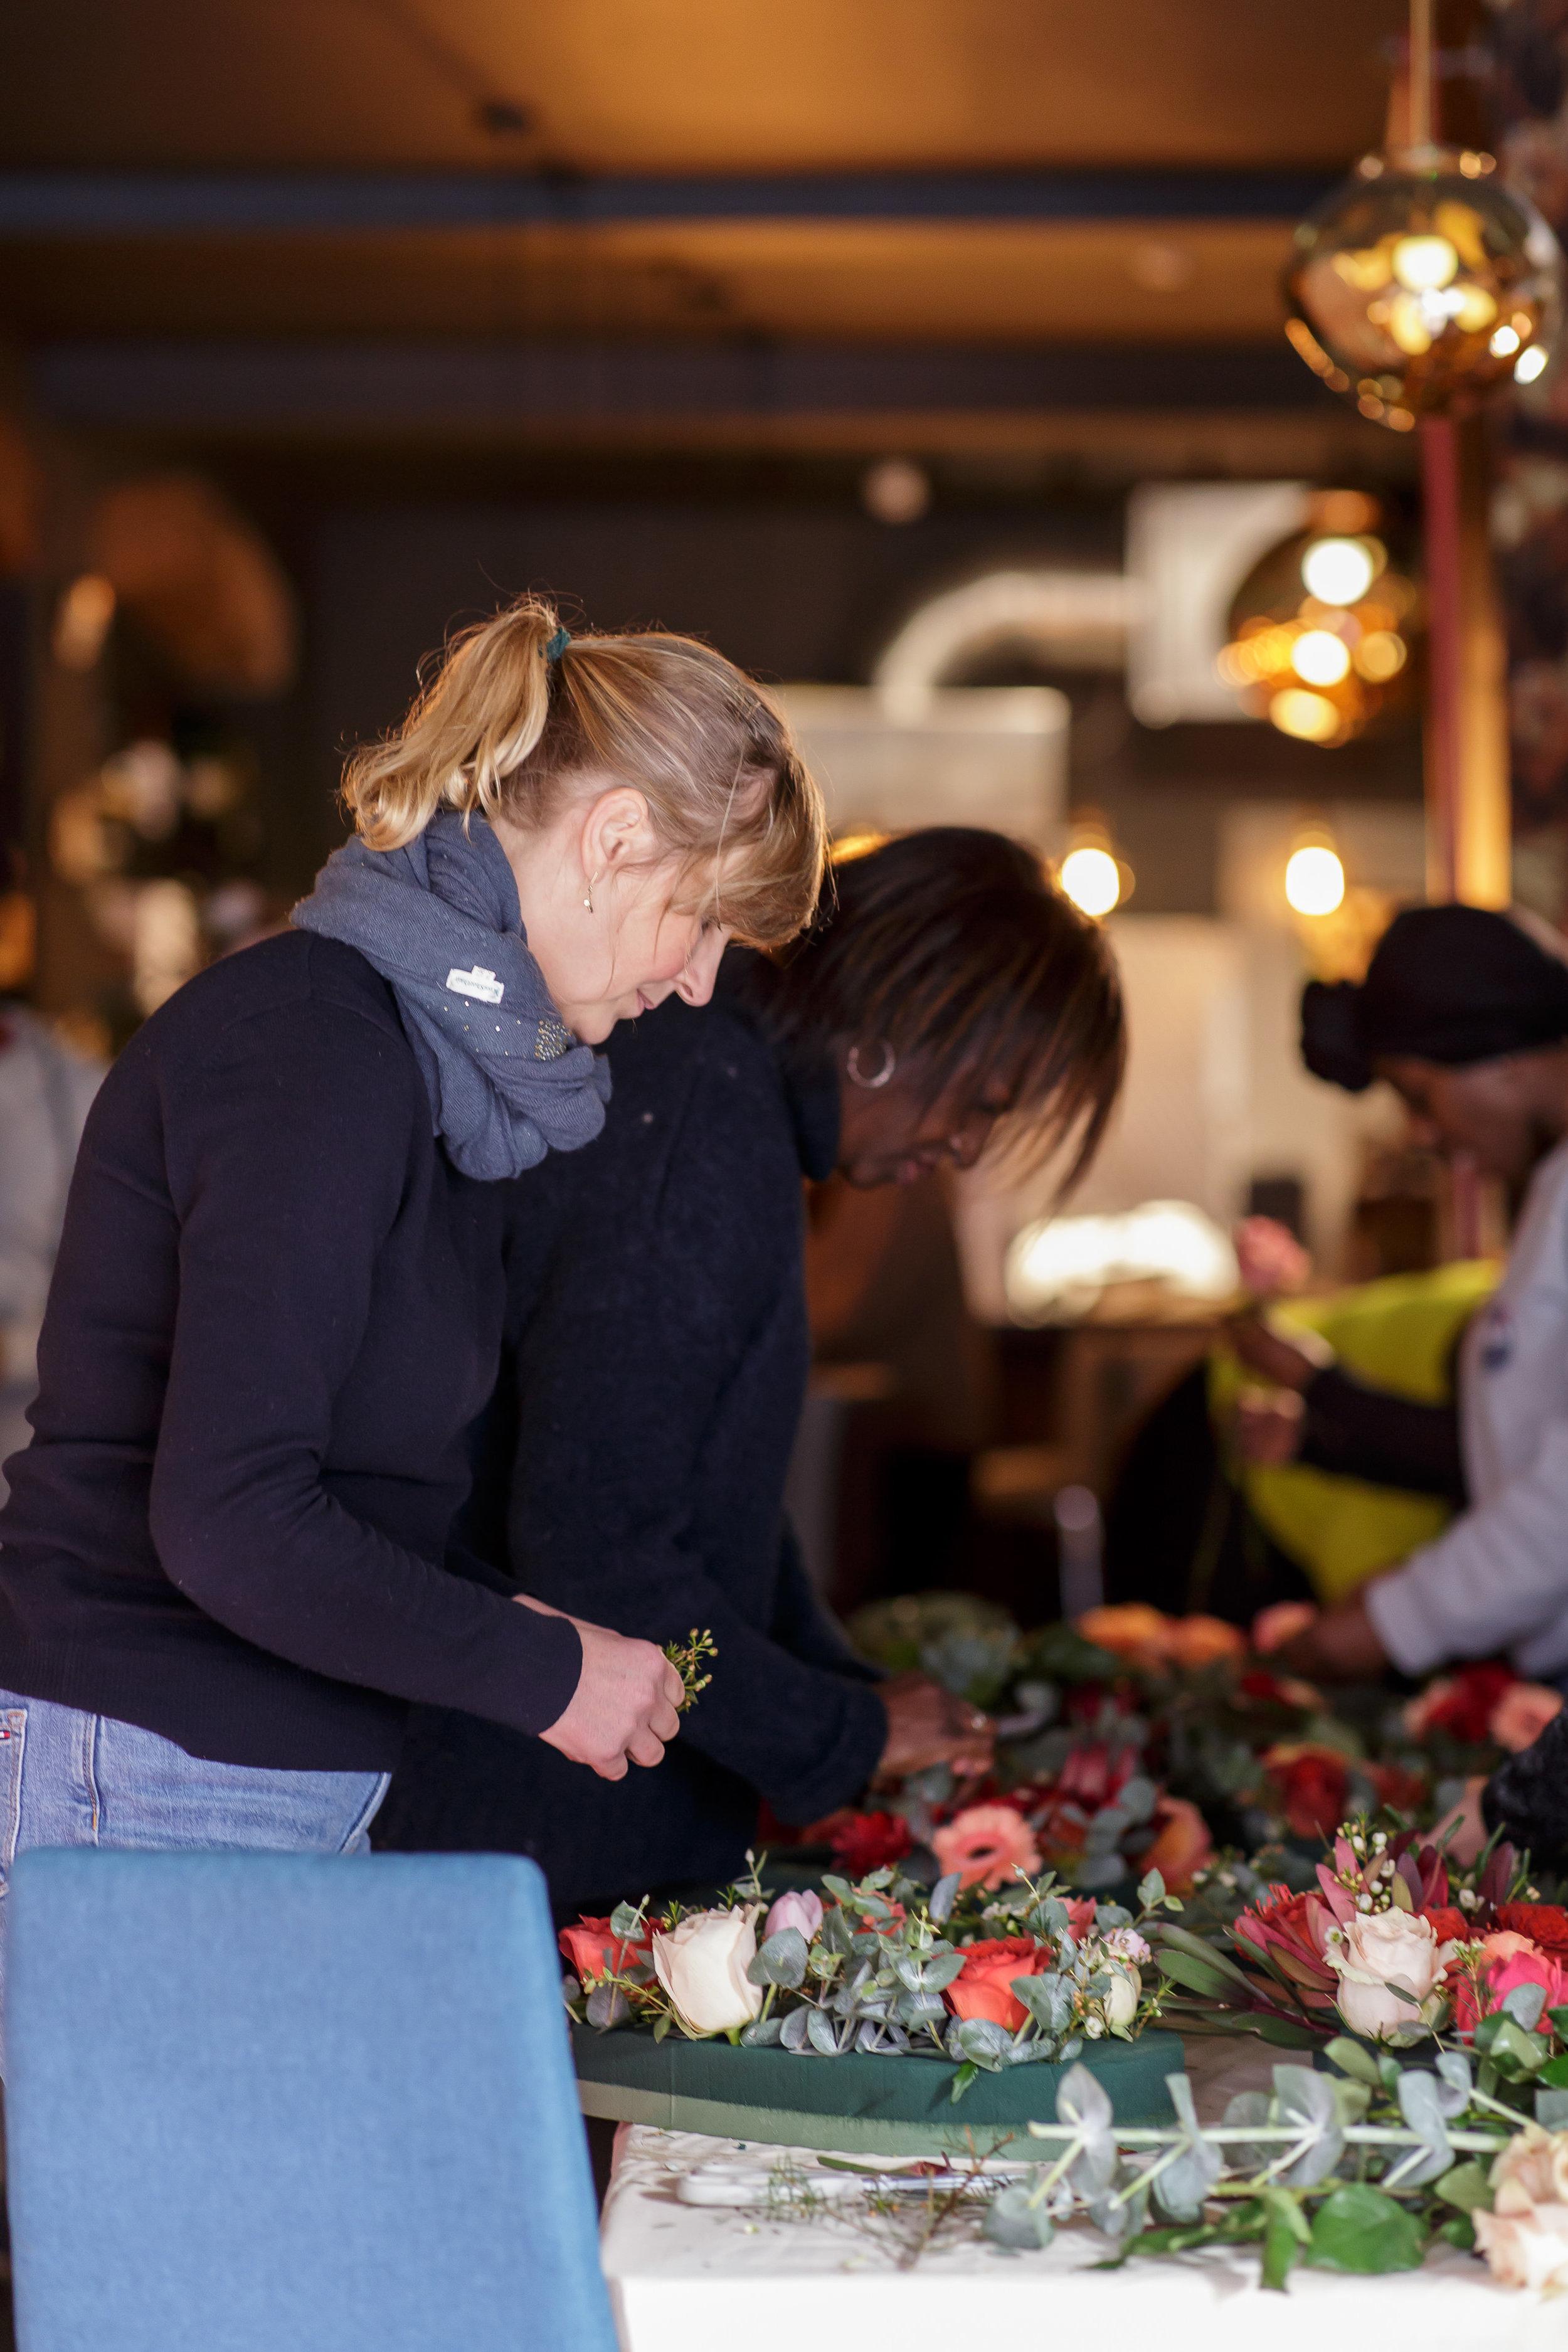 Bilen-Floral-Workshop-52.jpg